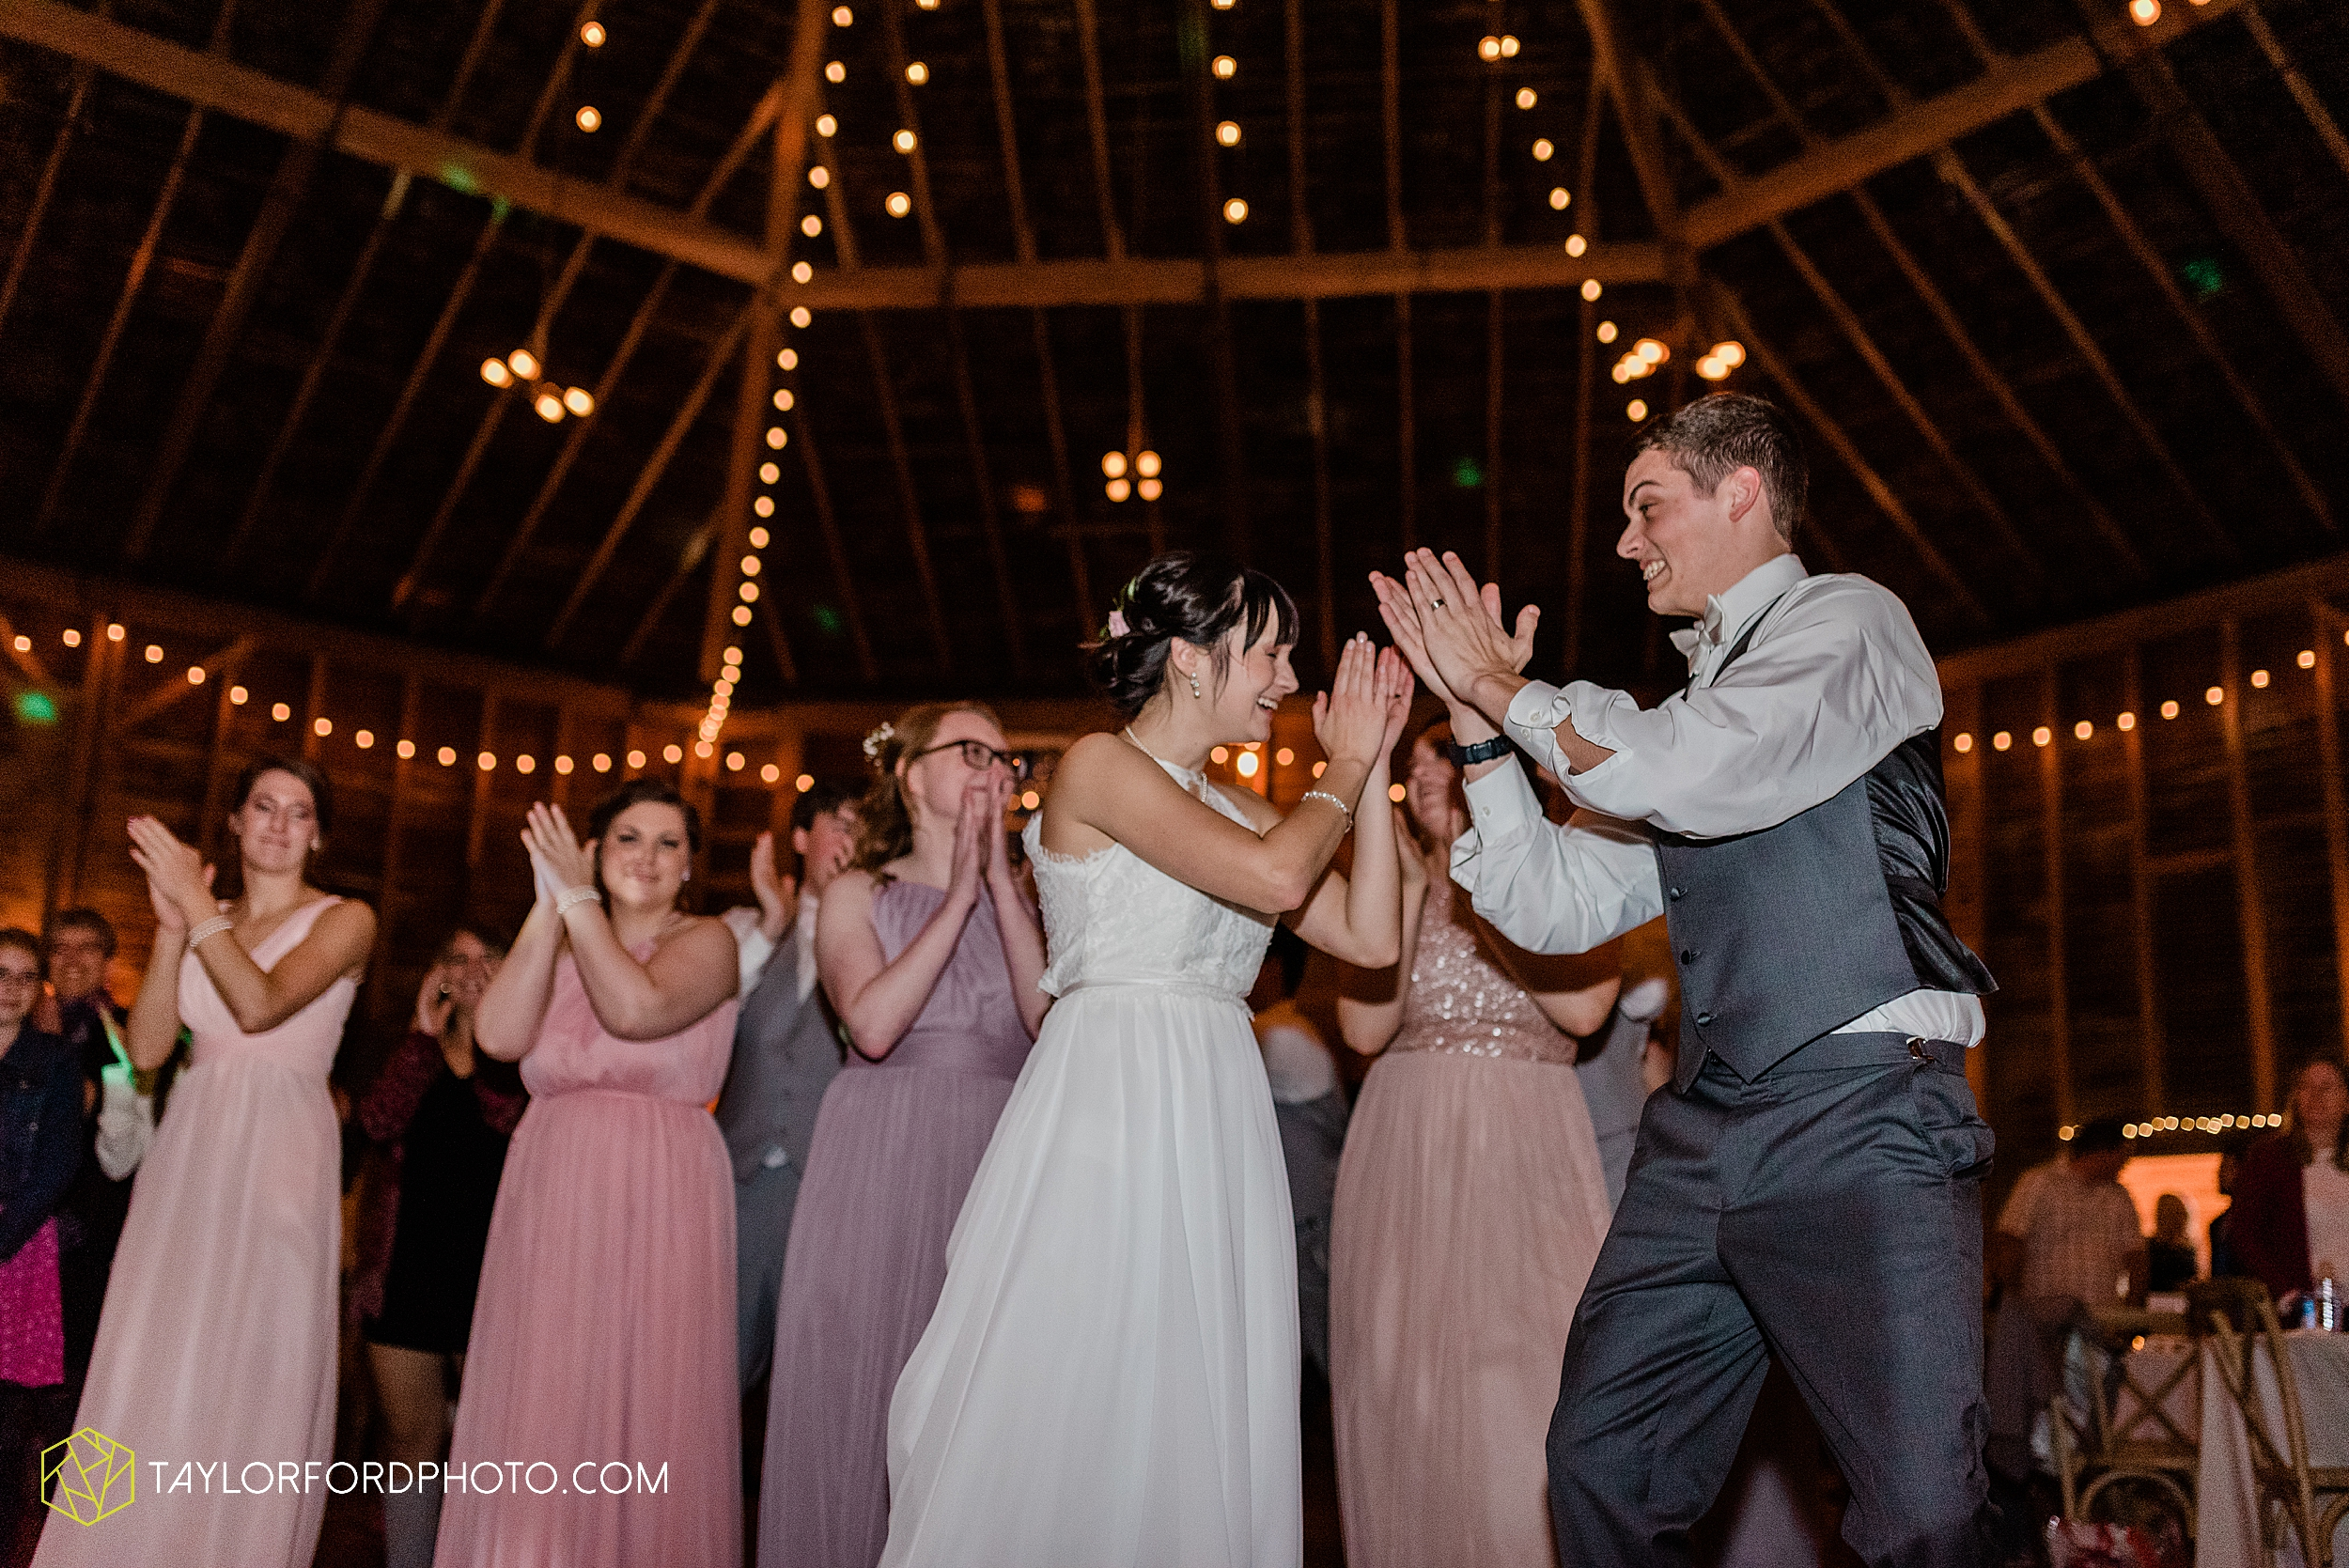 marissa-nicole-nick-daeger-orrmont-estate-farm-wedding-piqua-dayton-troy-ohio-fall-photographer-taylor-ford-photography_1569.jpg